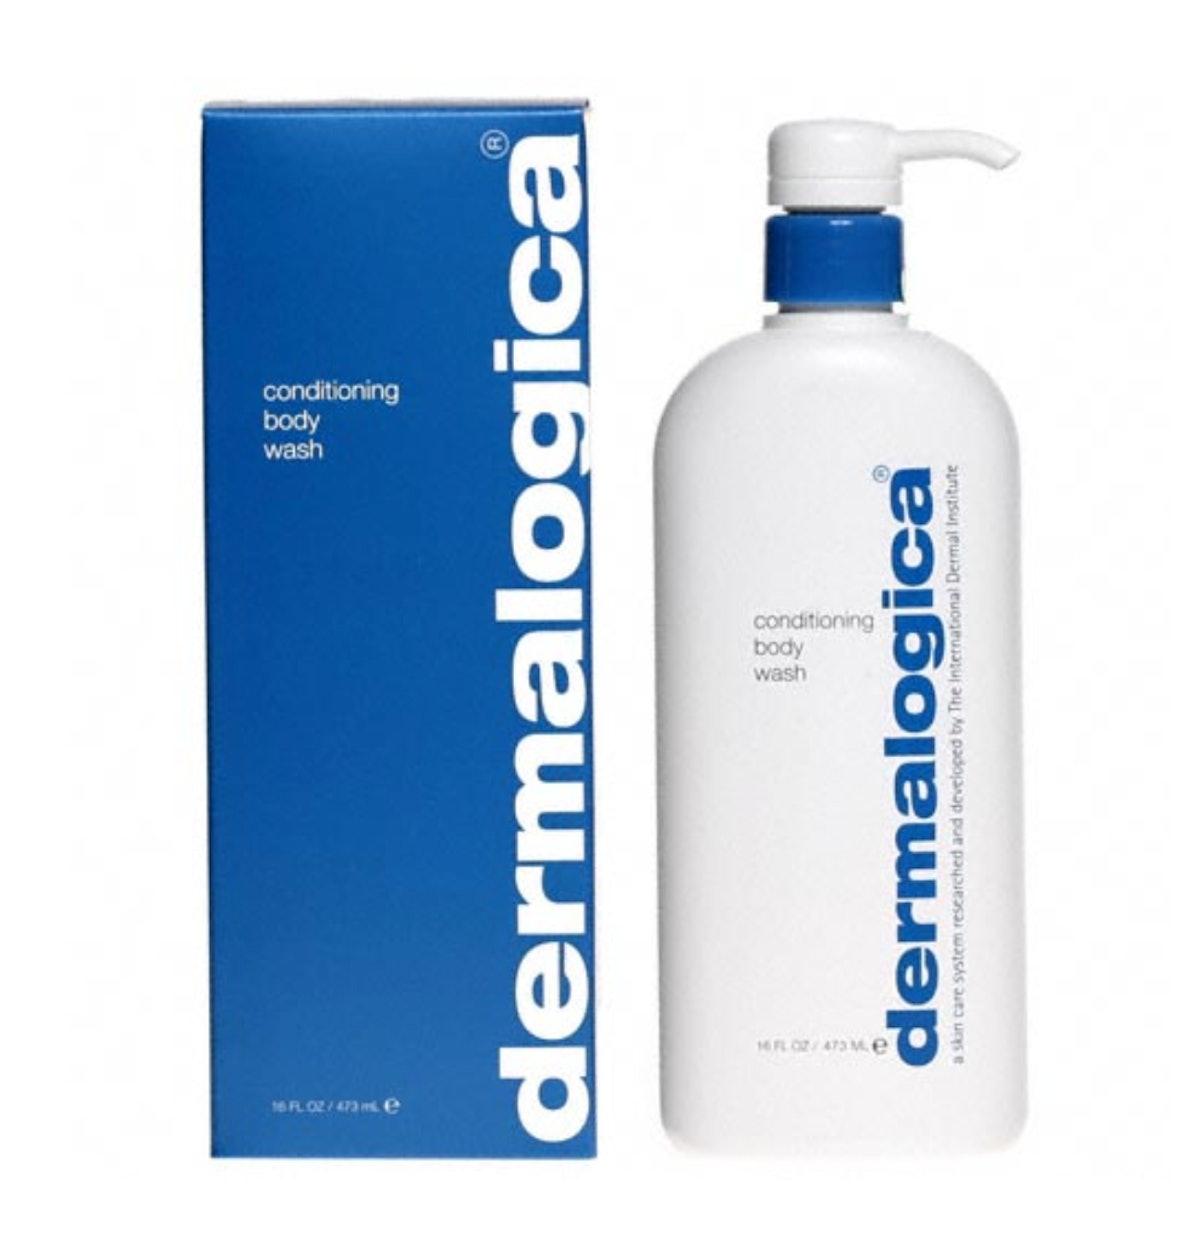 Dermalogica Conditioning Body Wash (16 oz.)